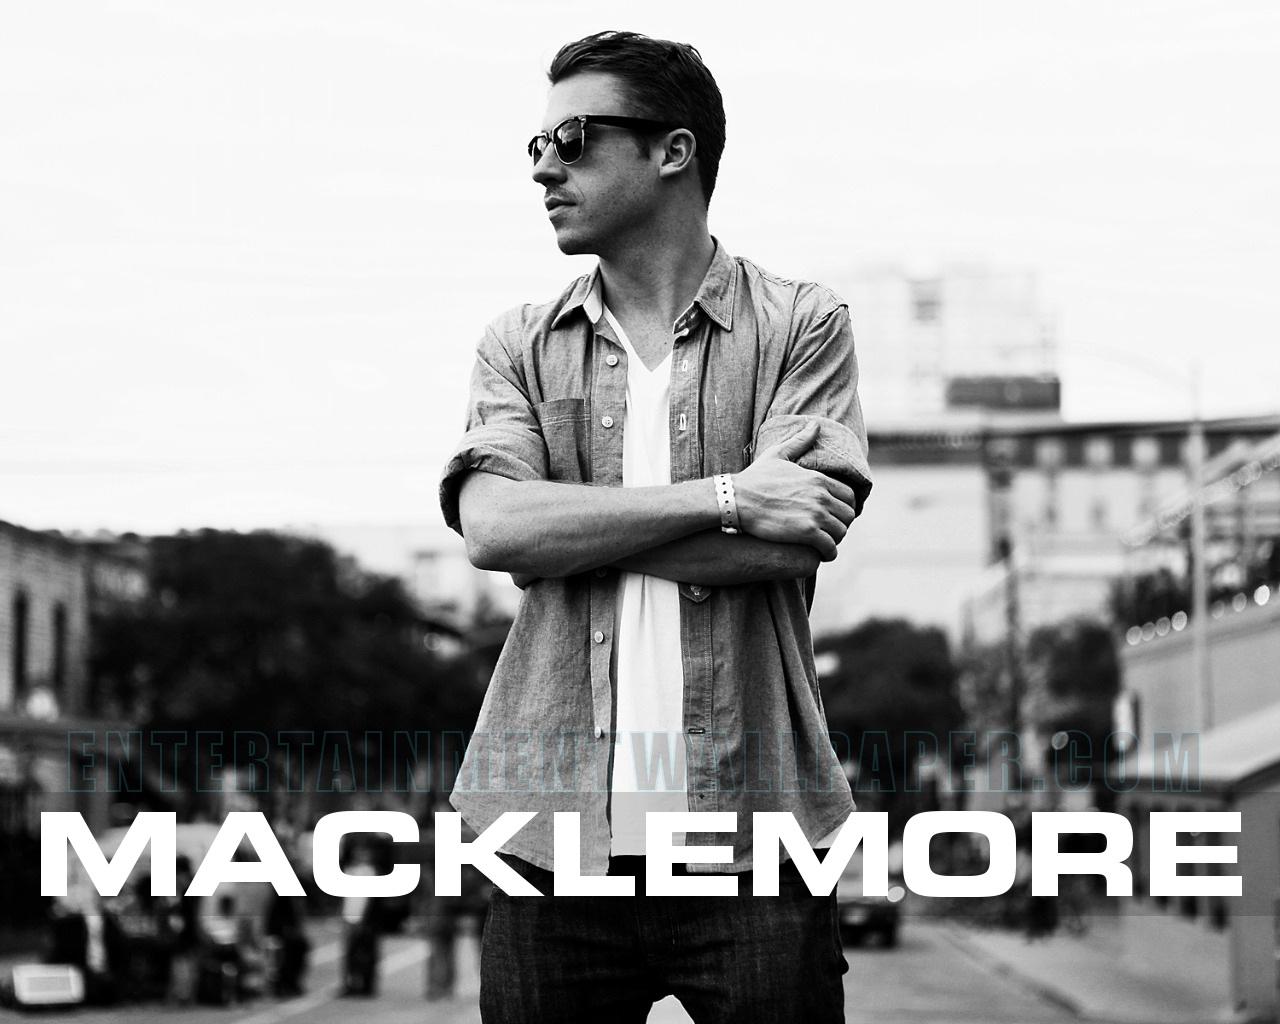 Macklemore Wallpaper - Original size, download now.